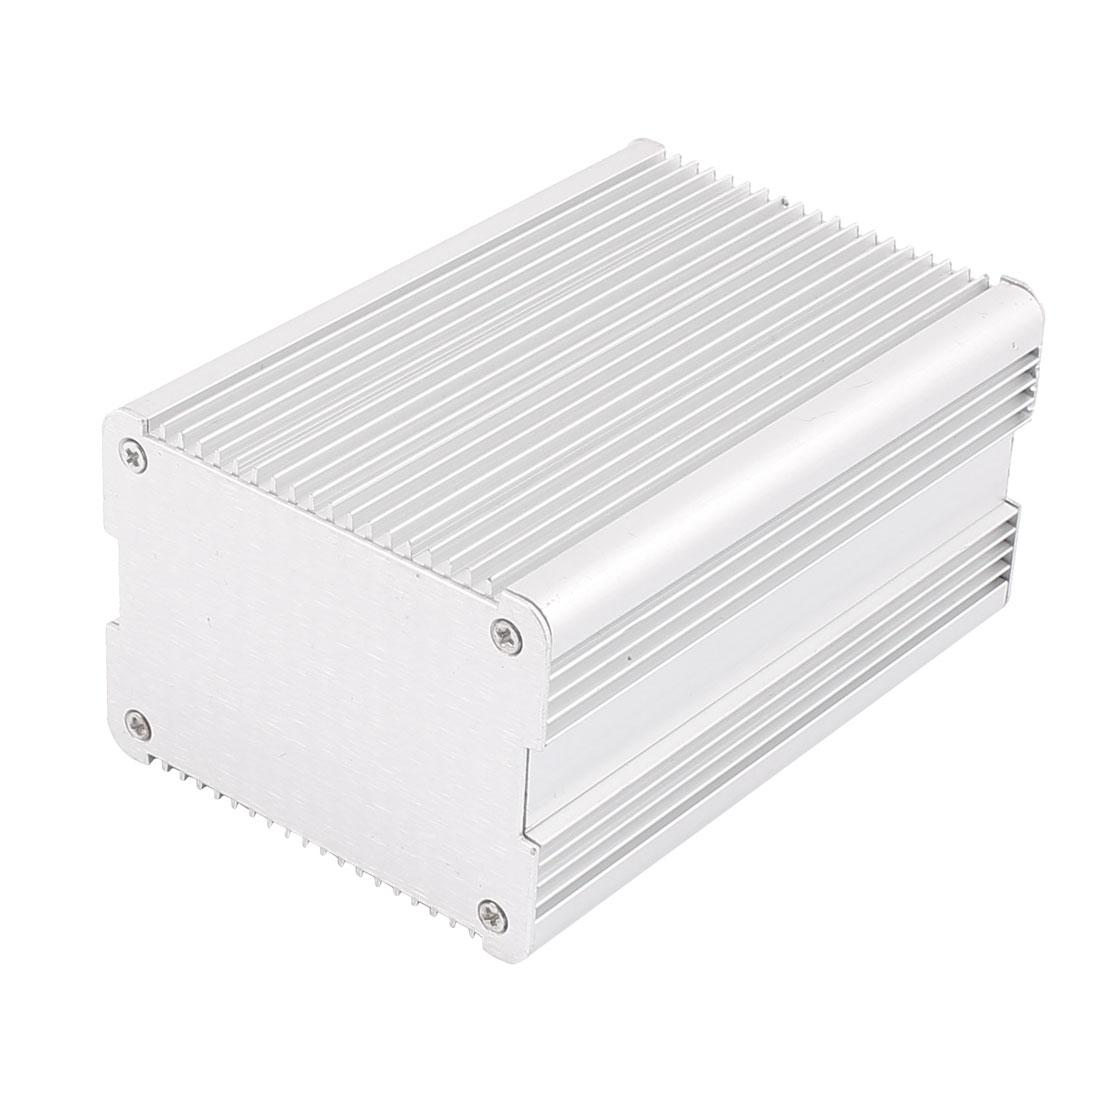 123 x 82 x 60mm Multi-purpose Electronic Extruded Aluminum Enclosure Silver Tone